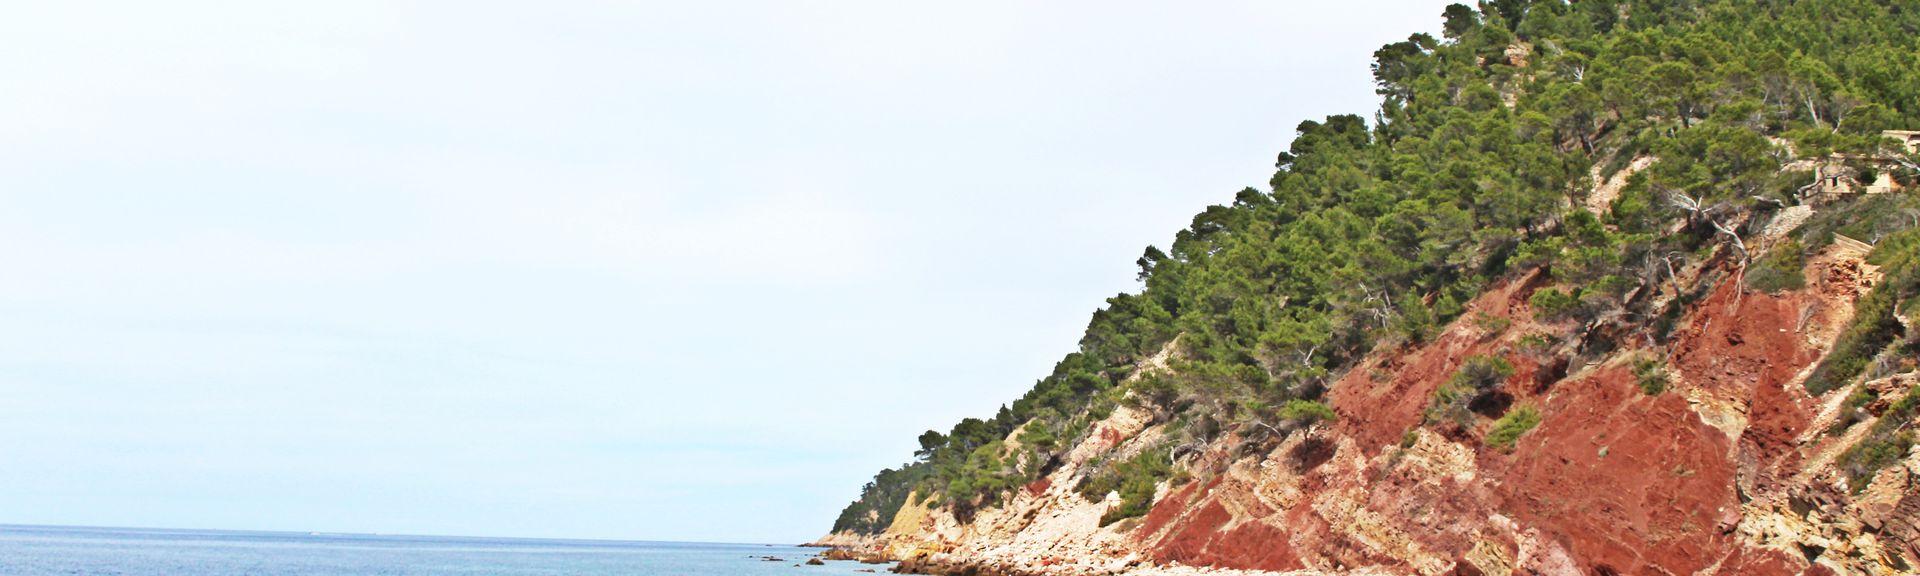 Santa Ponsa Beach, Calvia, Balearic Islands, Spain